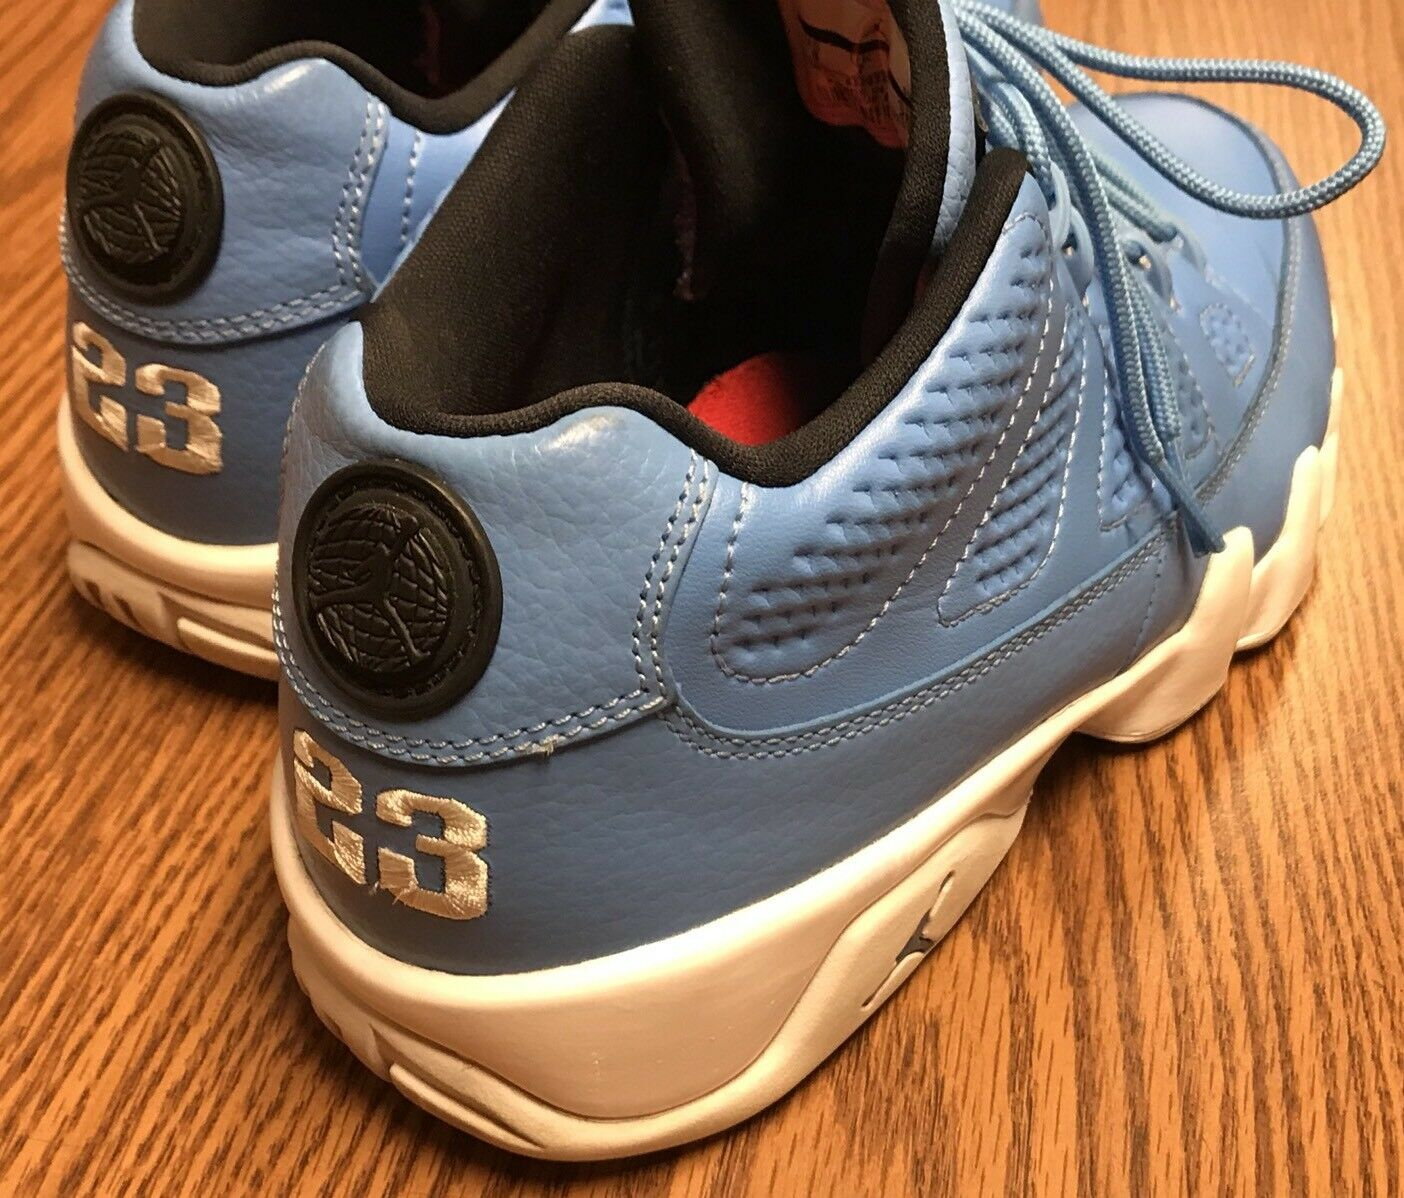 cheap for discount c7163 f3952 ... Nike 832822 401 Air Jordan 9 9 9 Retro Low Pantone University Blue  White Men s Sz ...